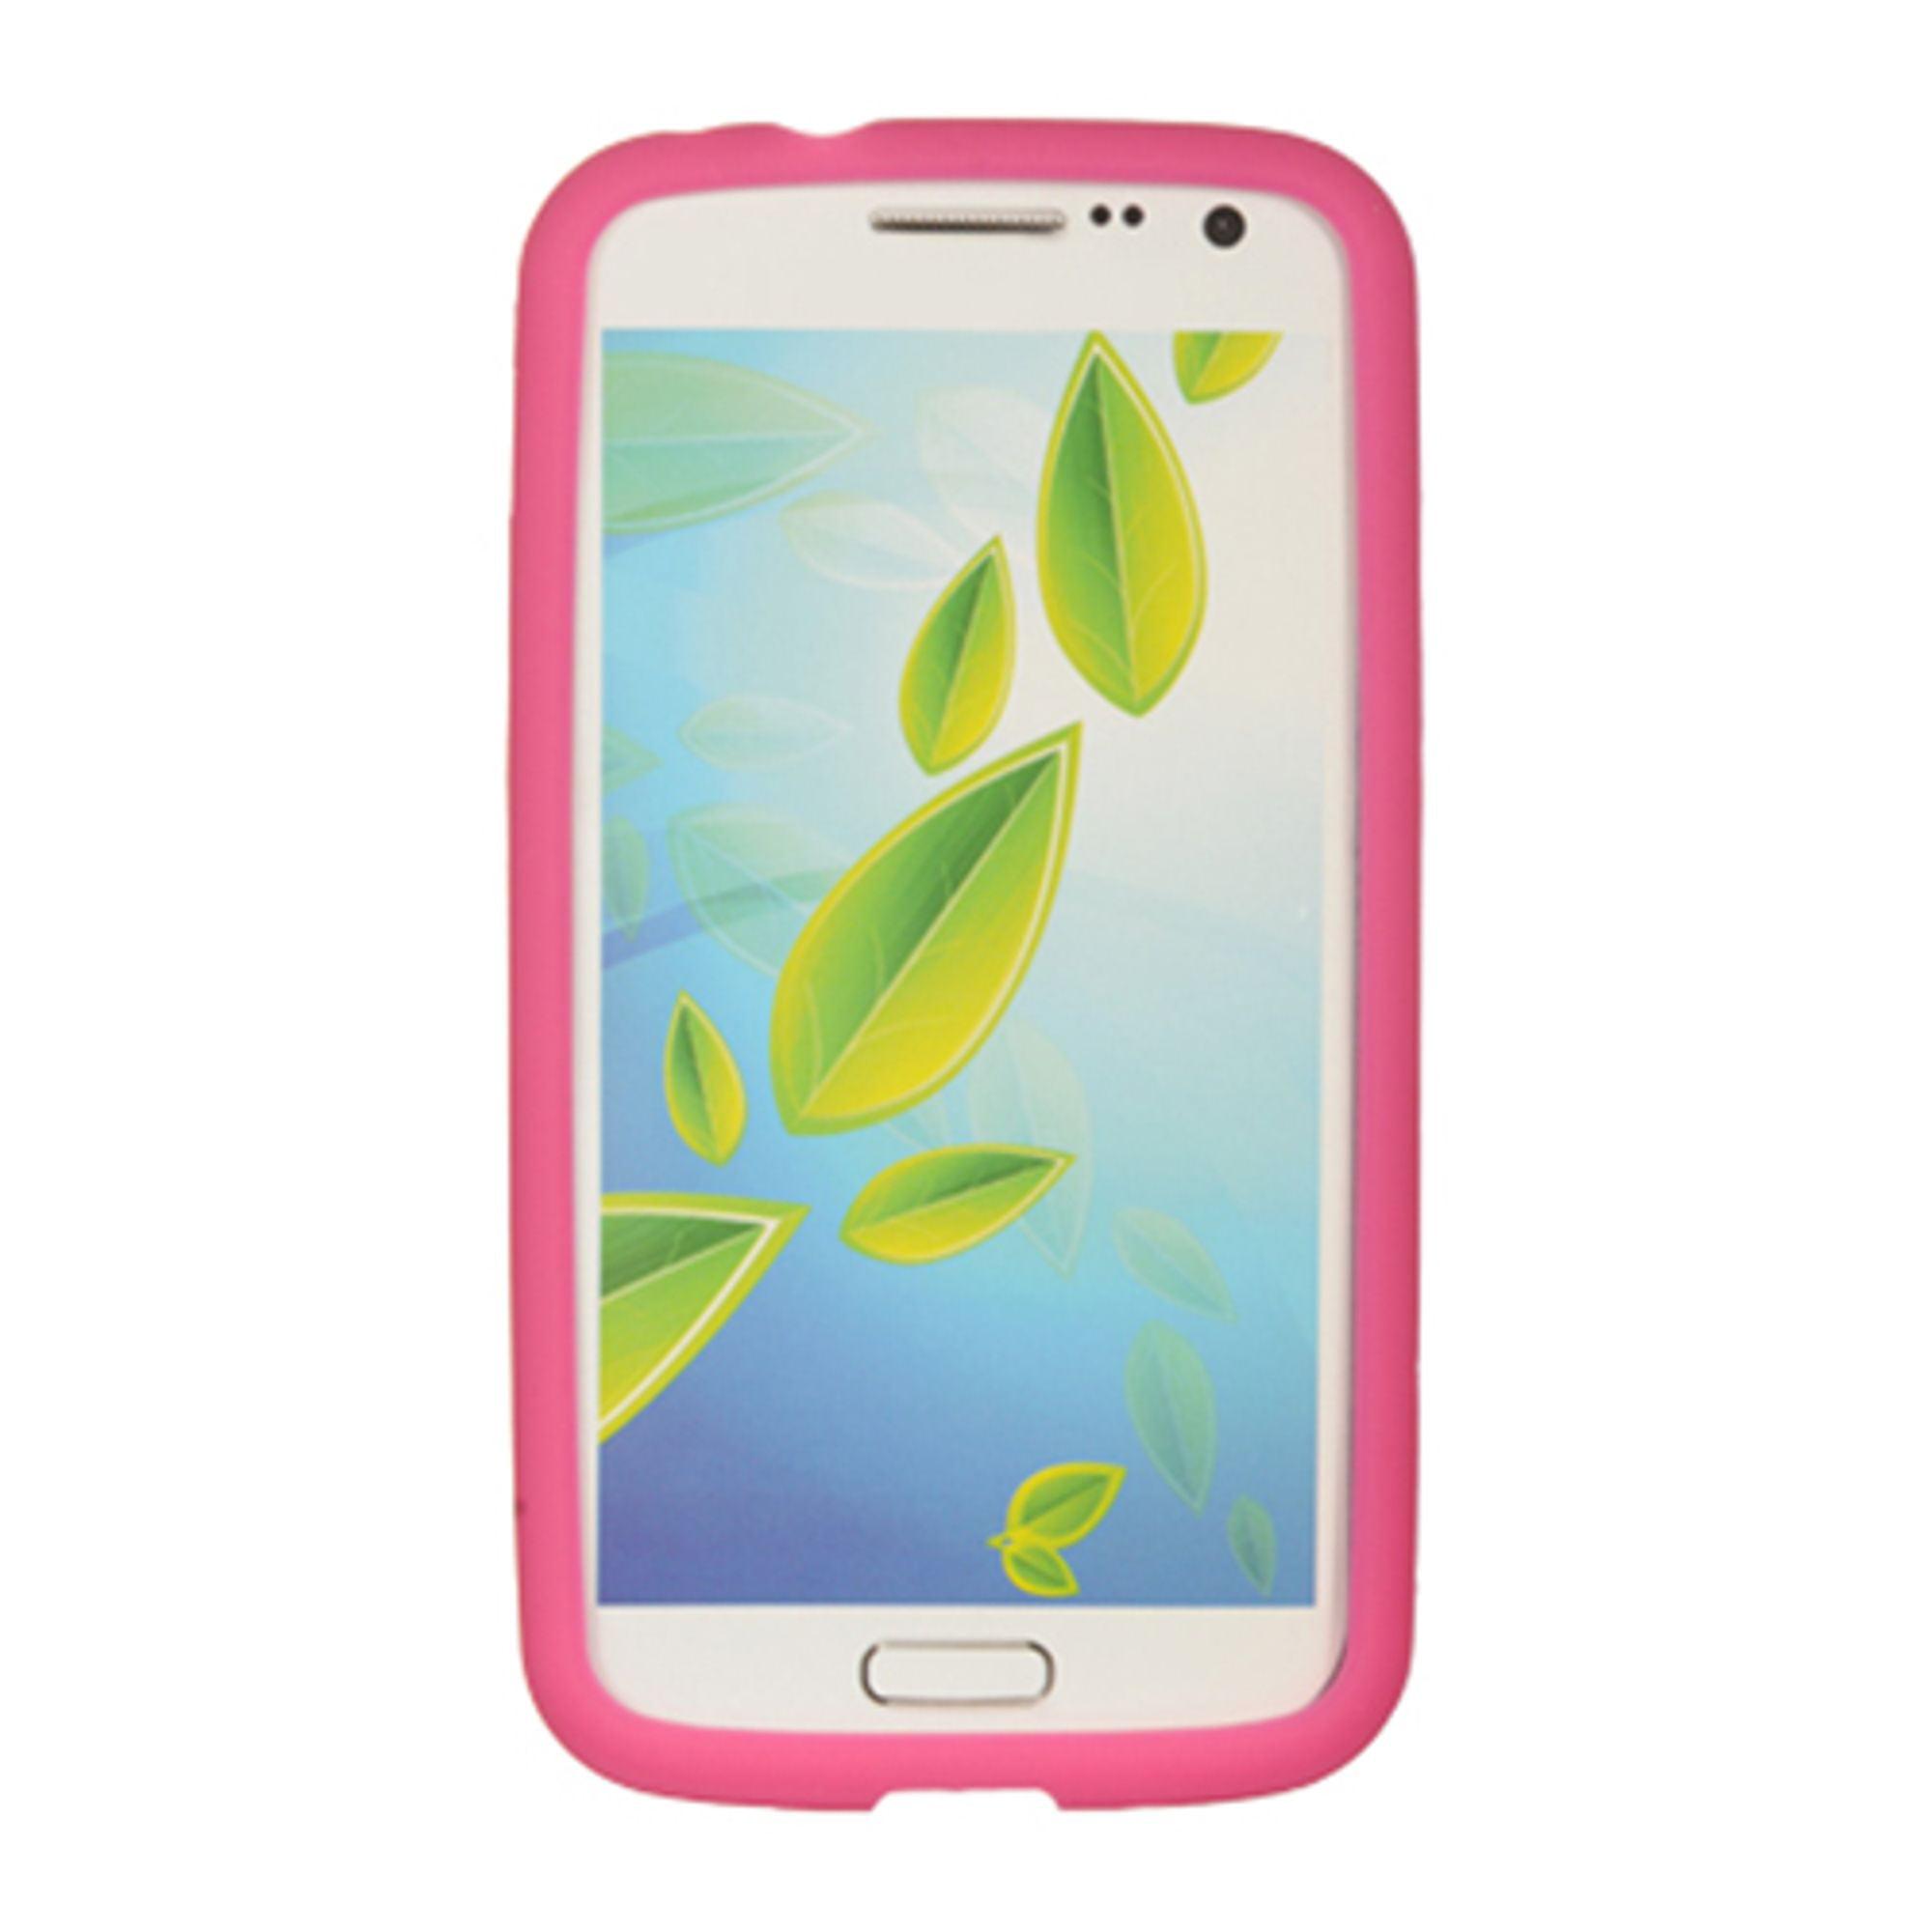 Samsung Galaxy Premier case, by Insten SIlicone Skin Back Soft Rubber Gel Case Cover For Samsung Galaxy Premier